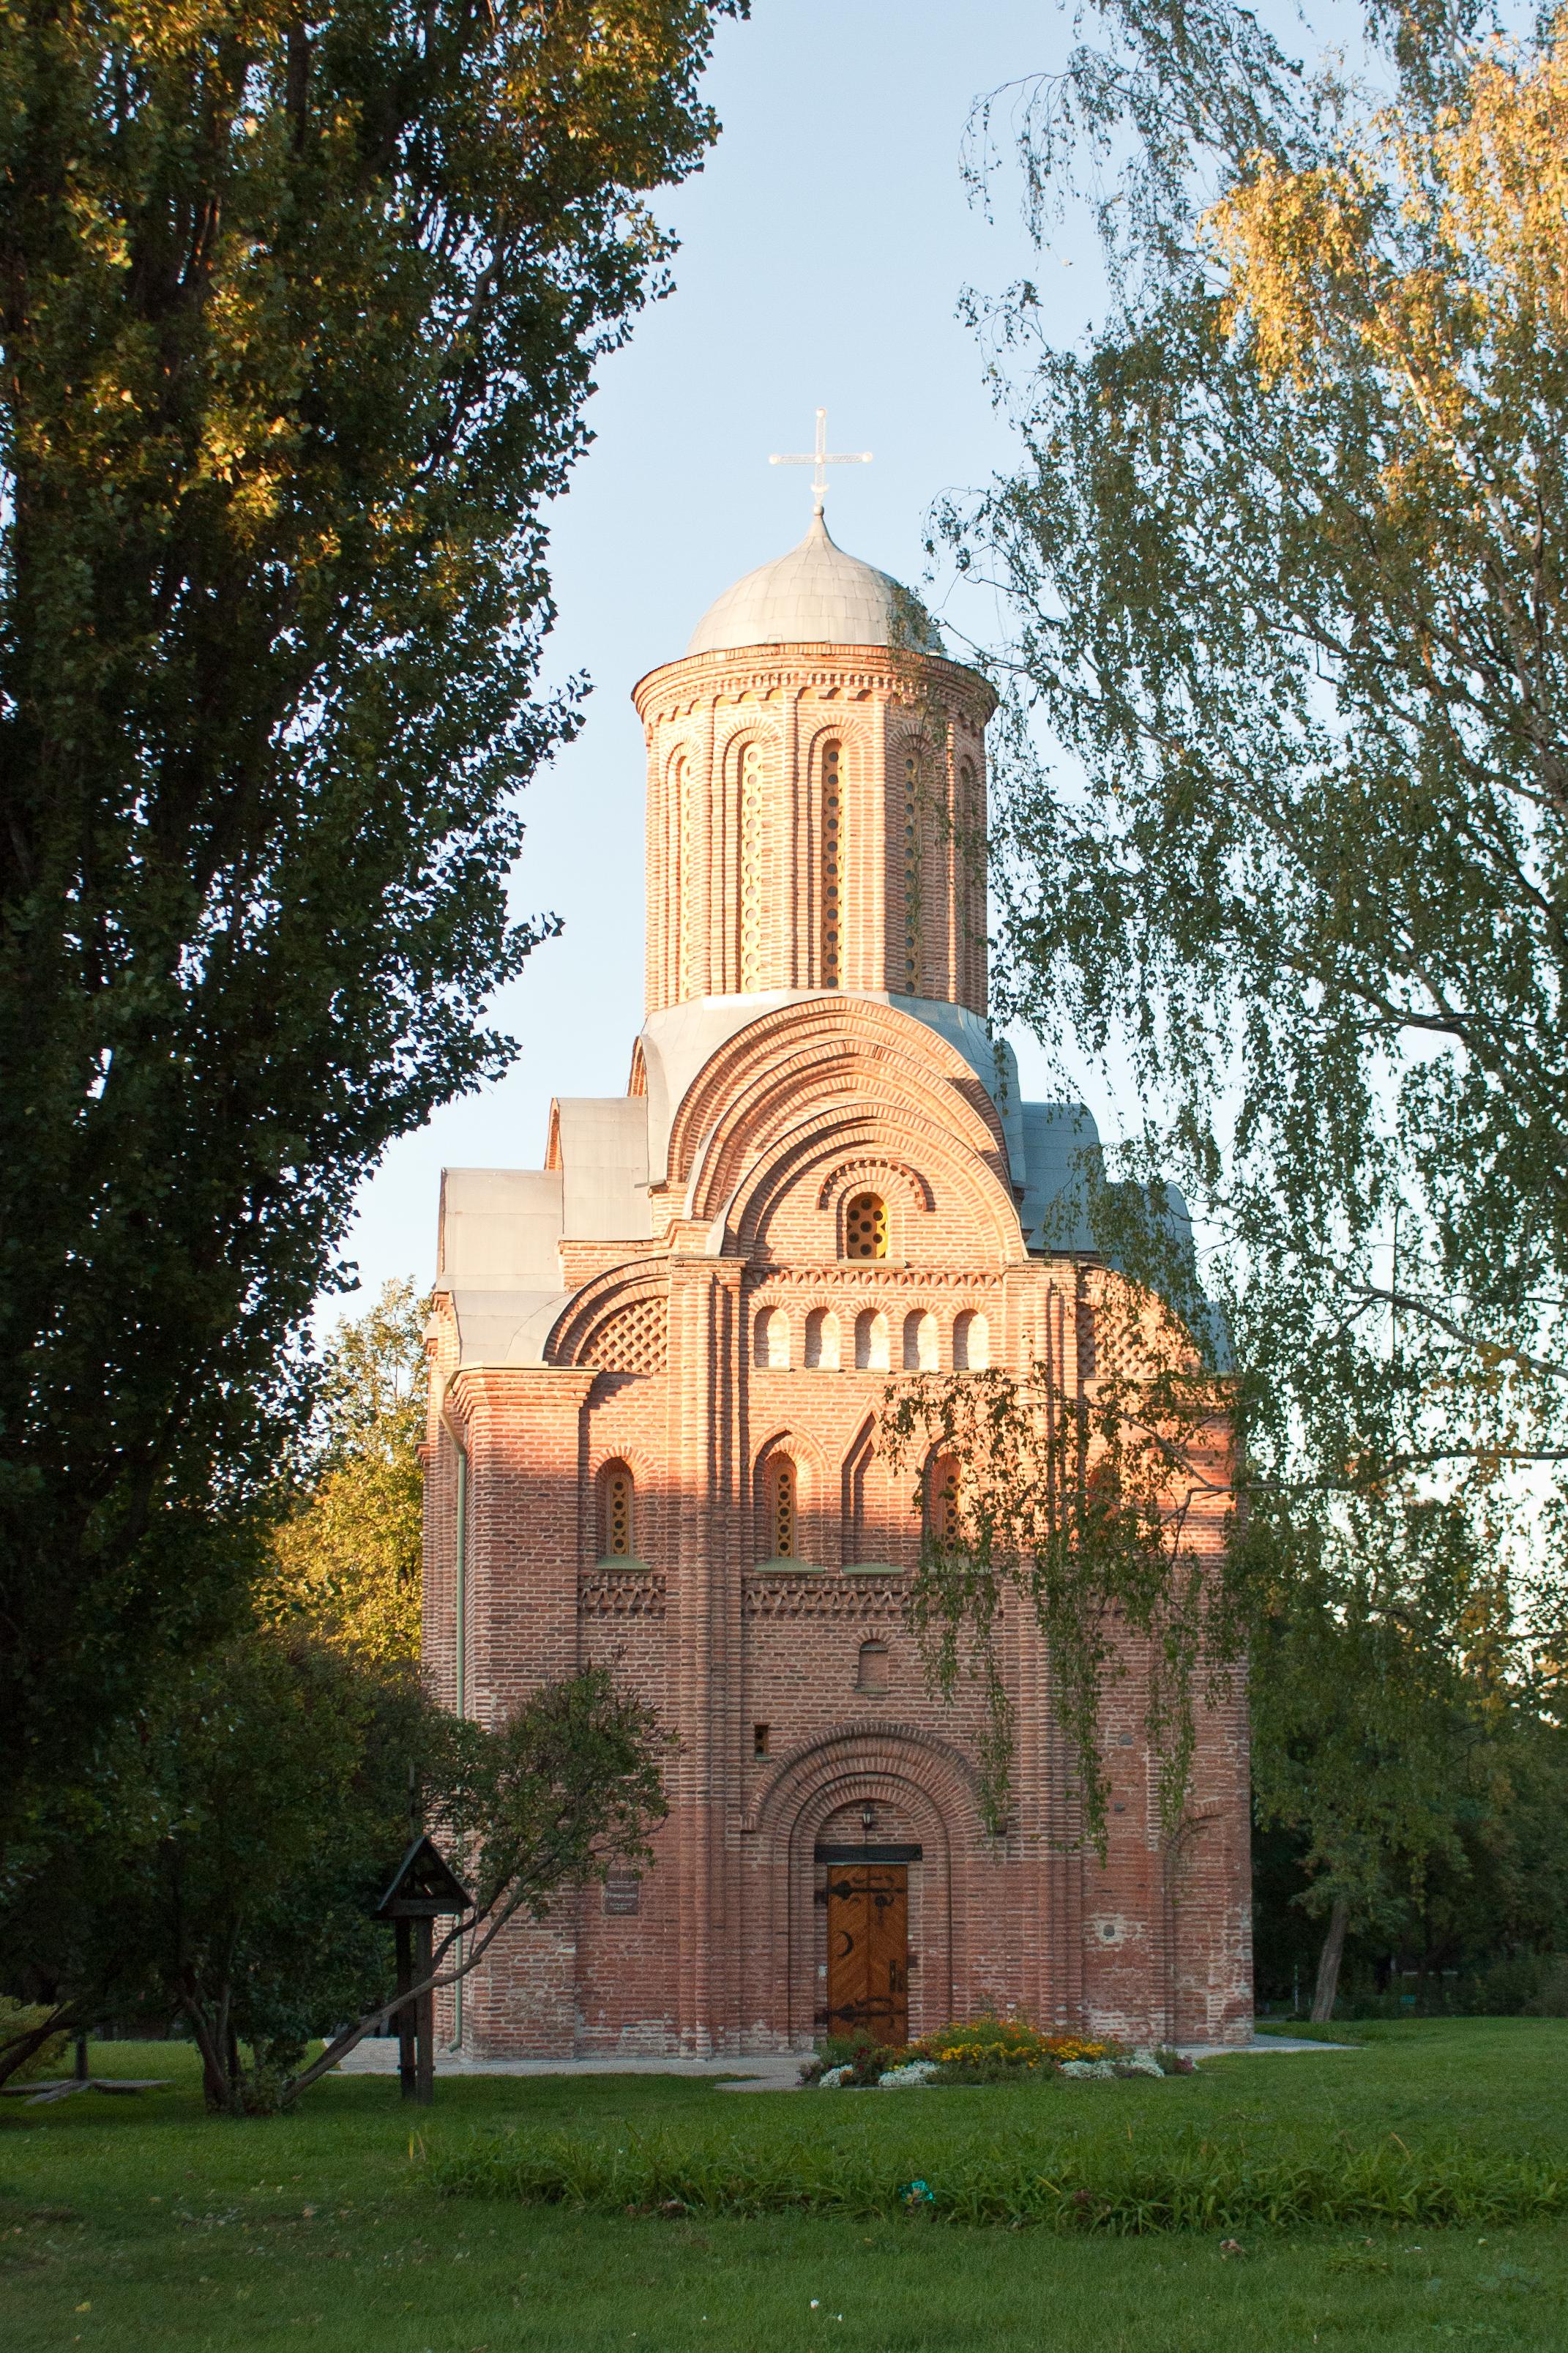 File:П'ятницька церква - Чернігів 4.jpg - Wikimedia Commons